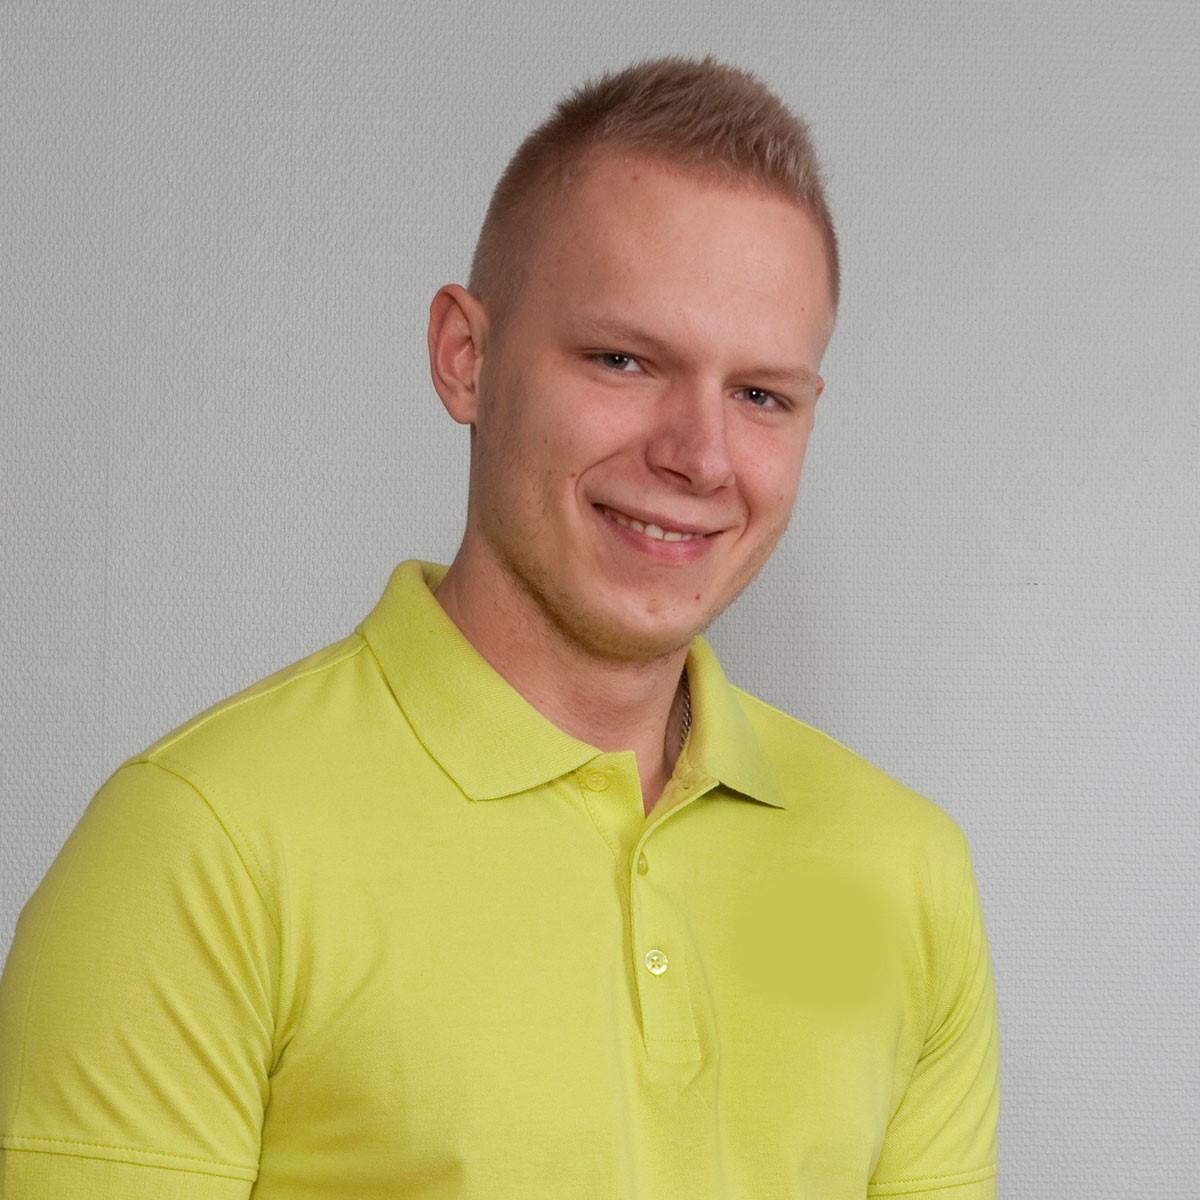 Daniel Sandberg